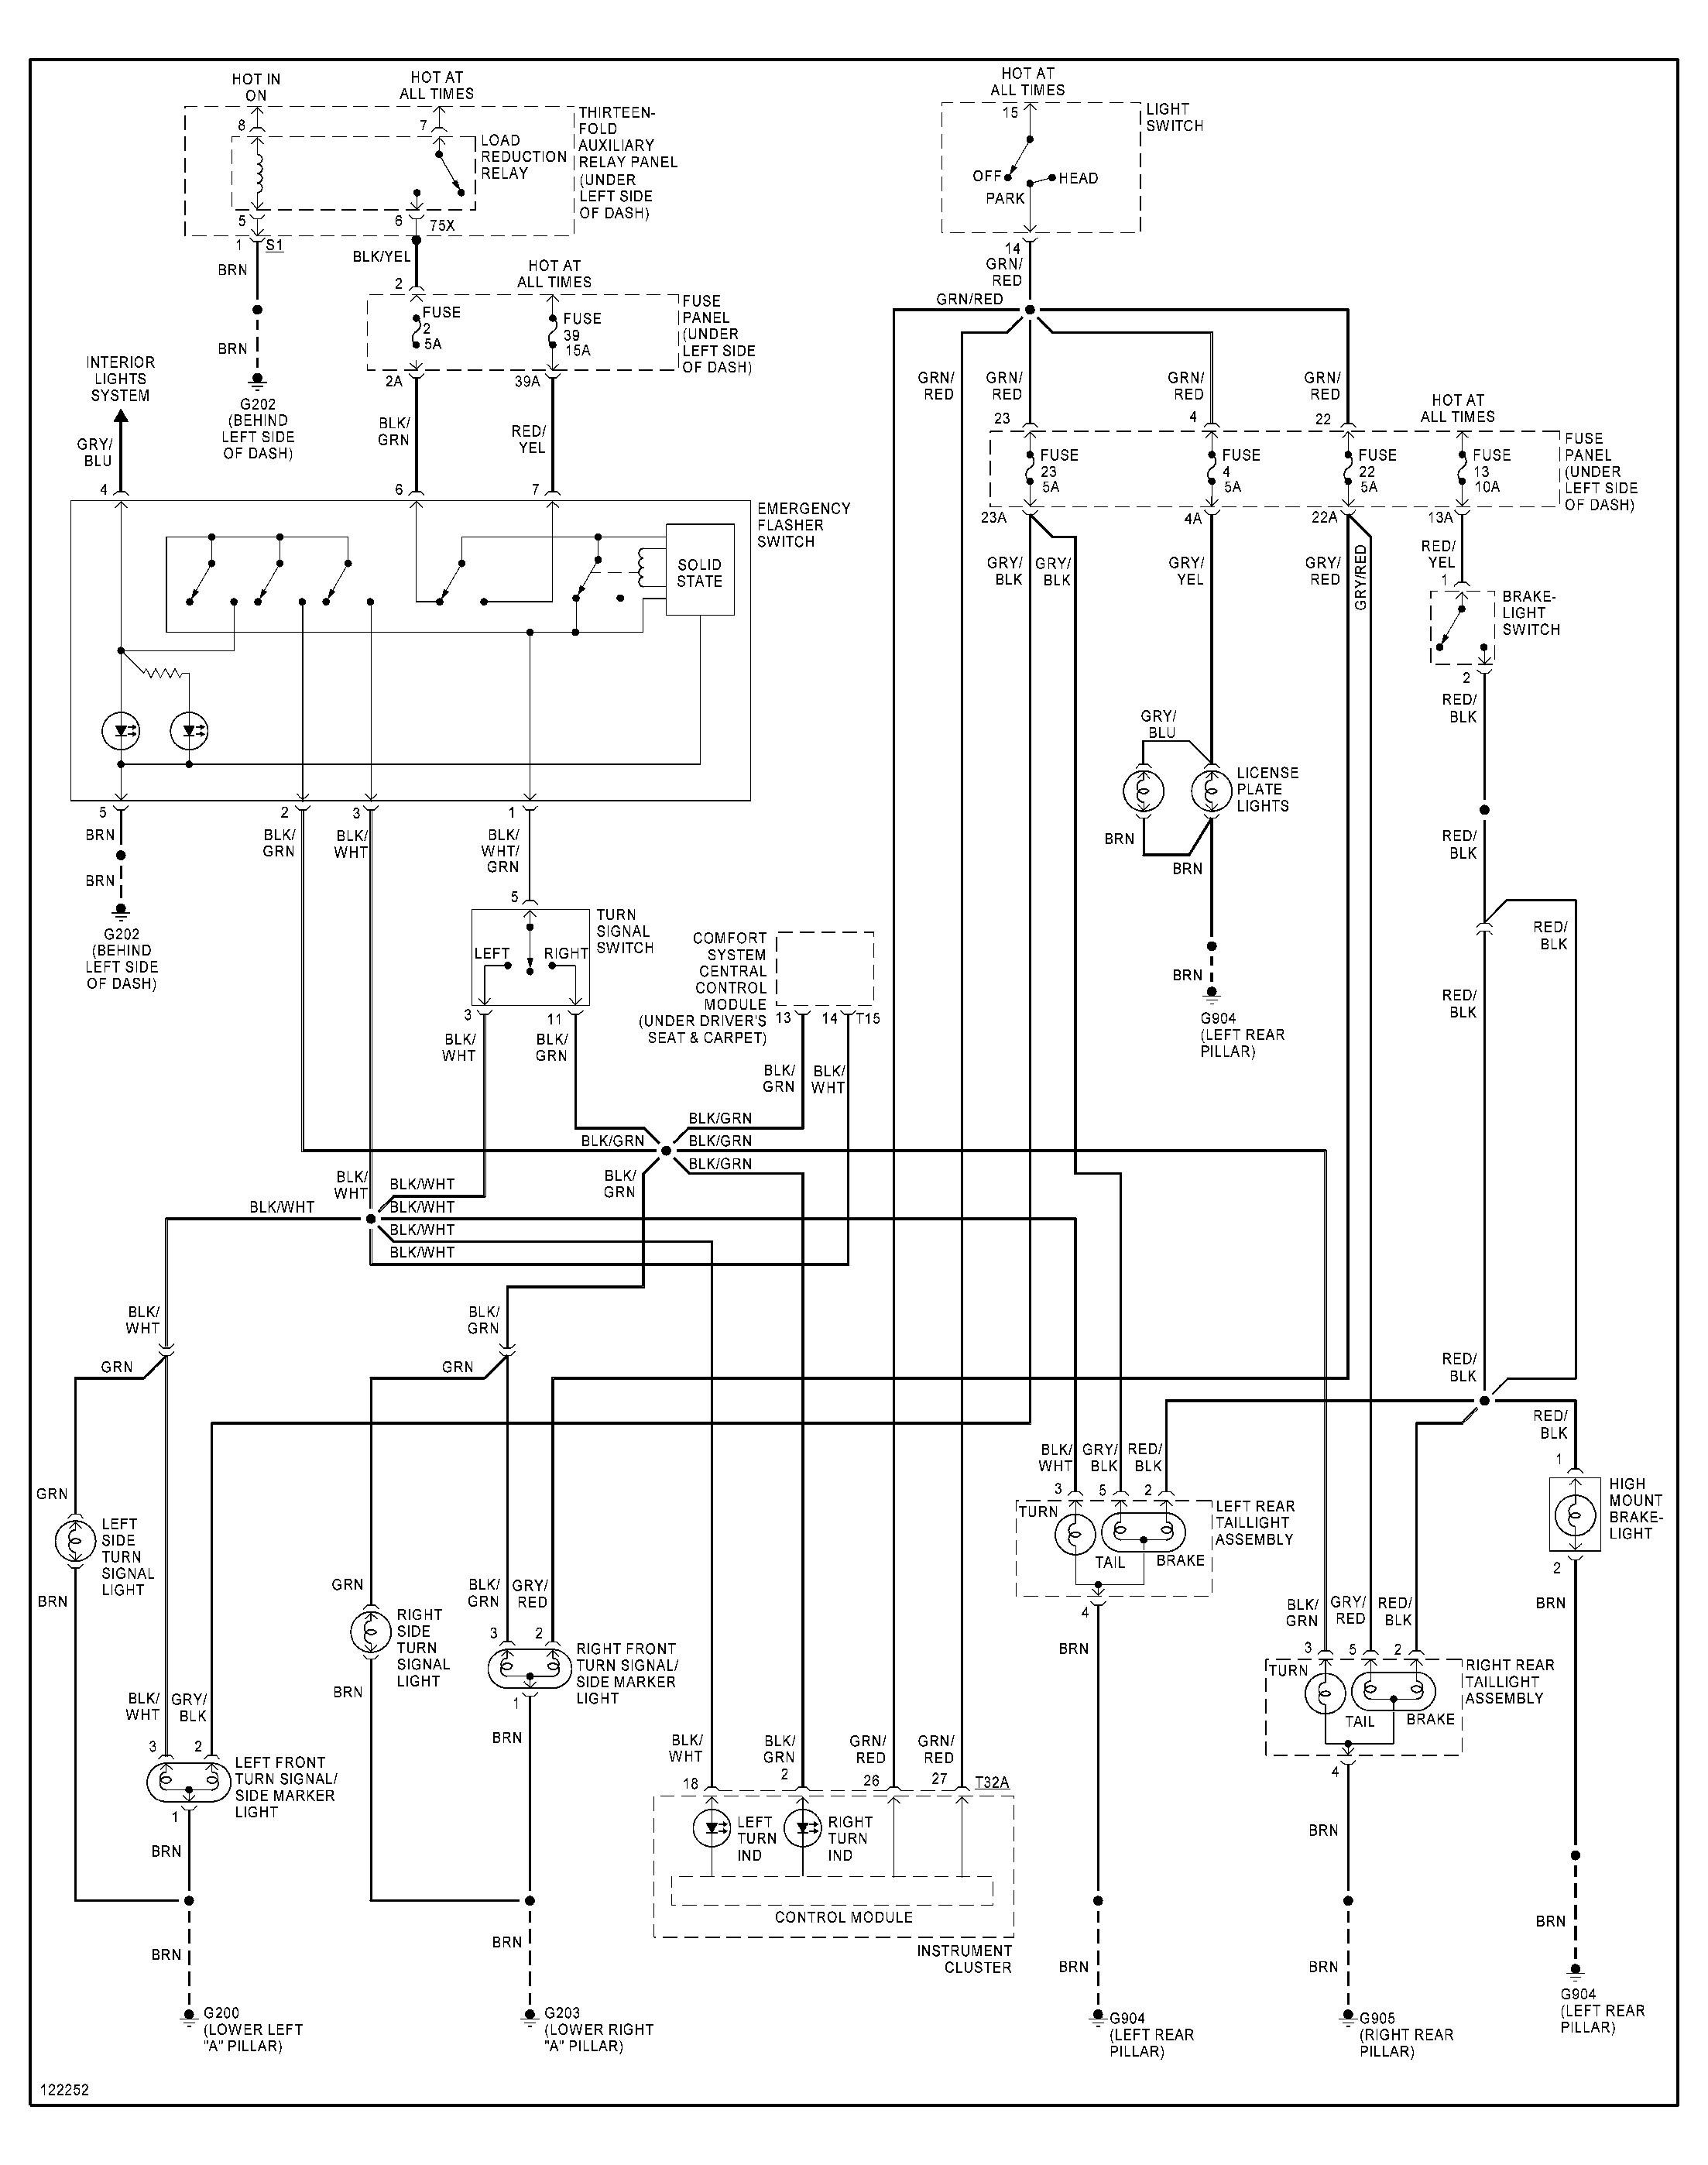 2006 Vw Jetta Engine Diagram Front Sensor 2011 Vw Jetta Wiring Diagram Wire Center • – Wiring Of 2006 Vw Jetta Engine Diagram